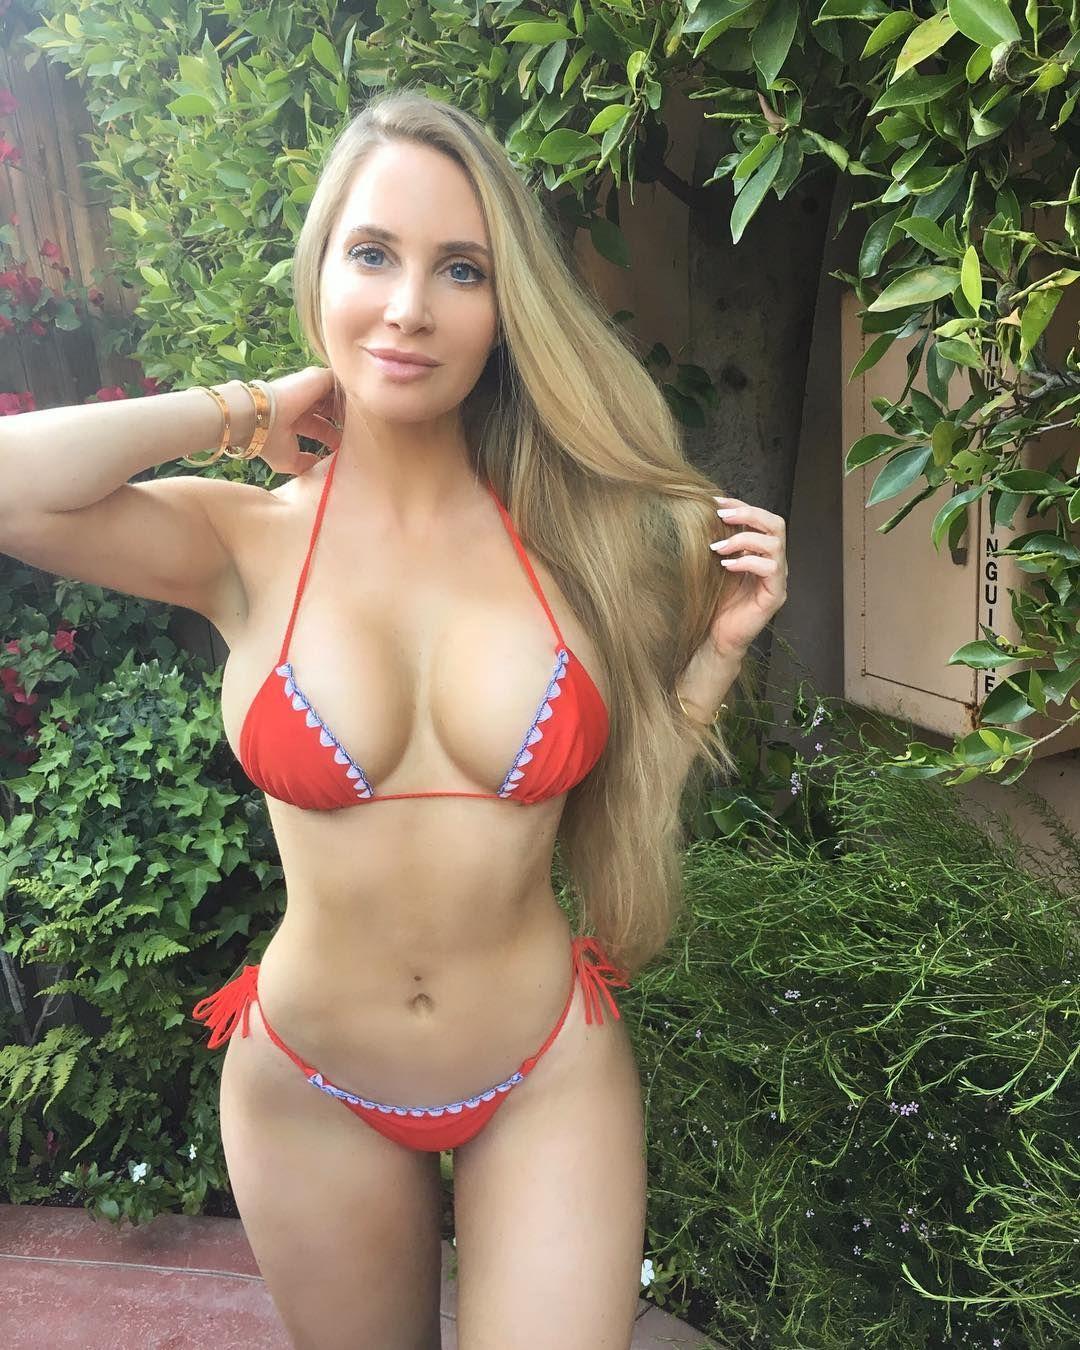 Tiny bikini xxx images 40